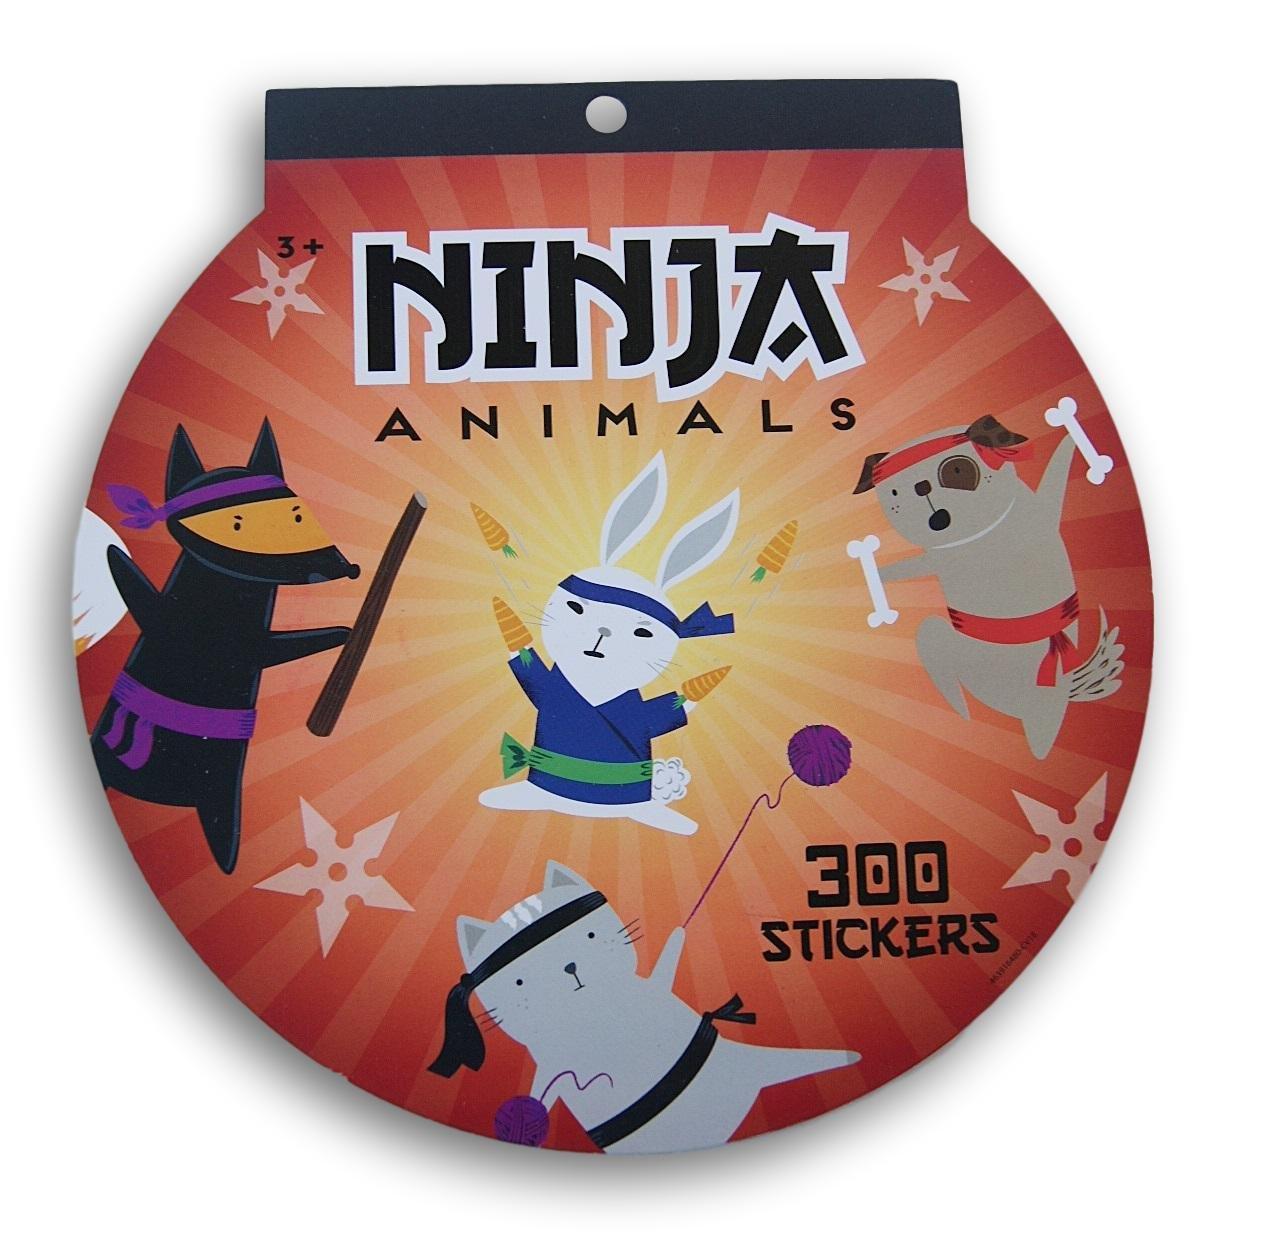 Ninja Animals Sticker Pad - 8x8 Inches - 300 Stickers